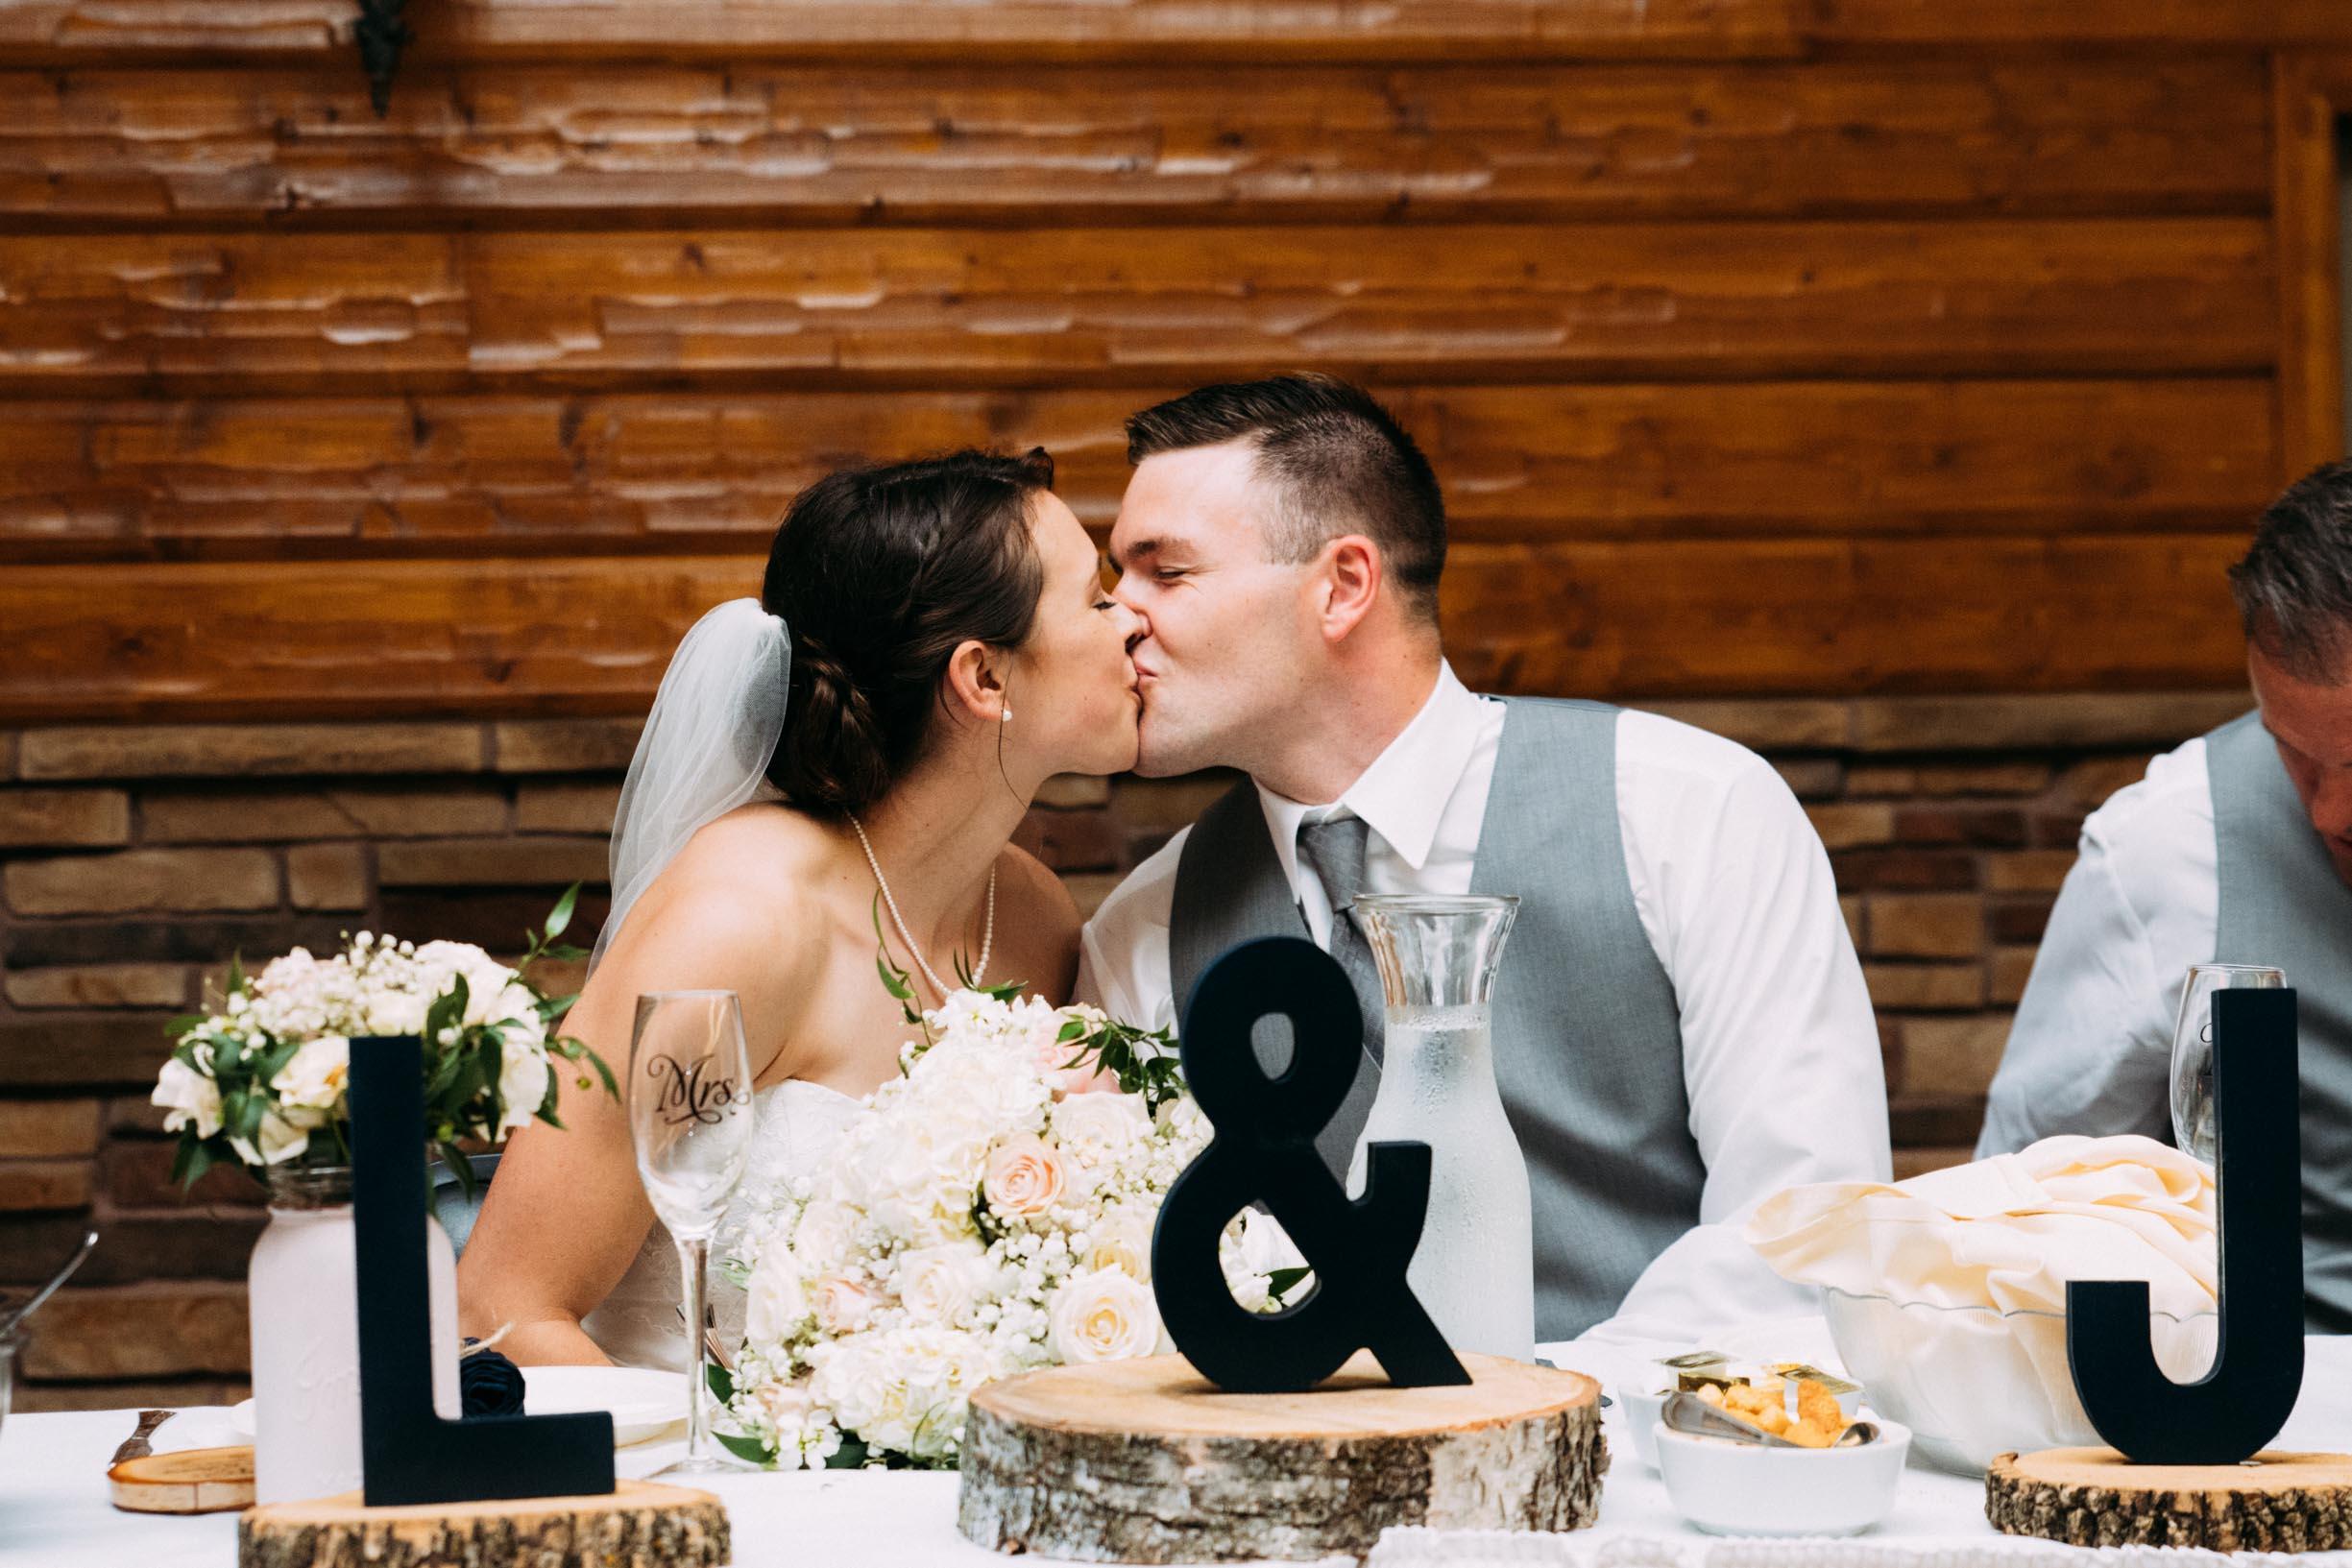 34-Lindsey Jake Wedding Reception Winona_.jpg